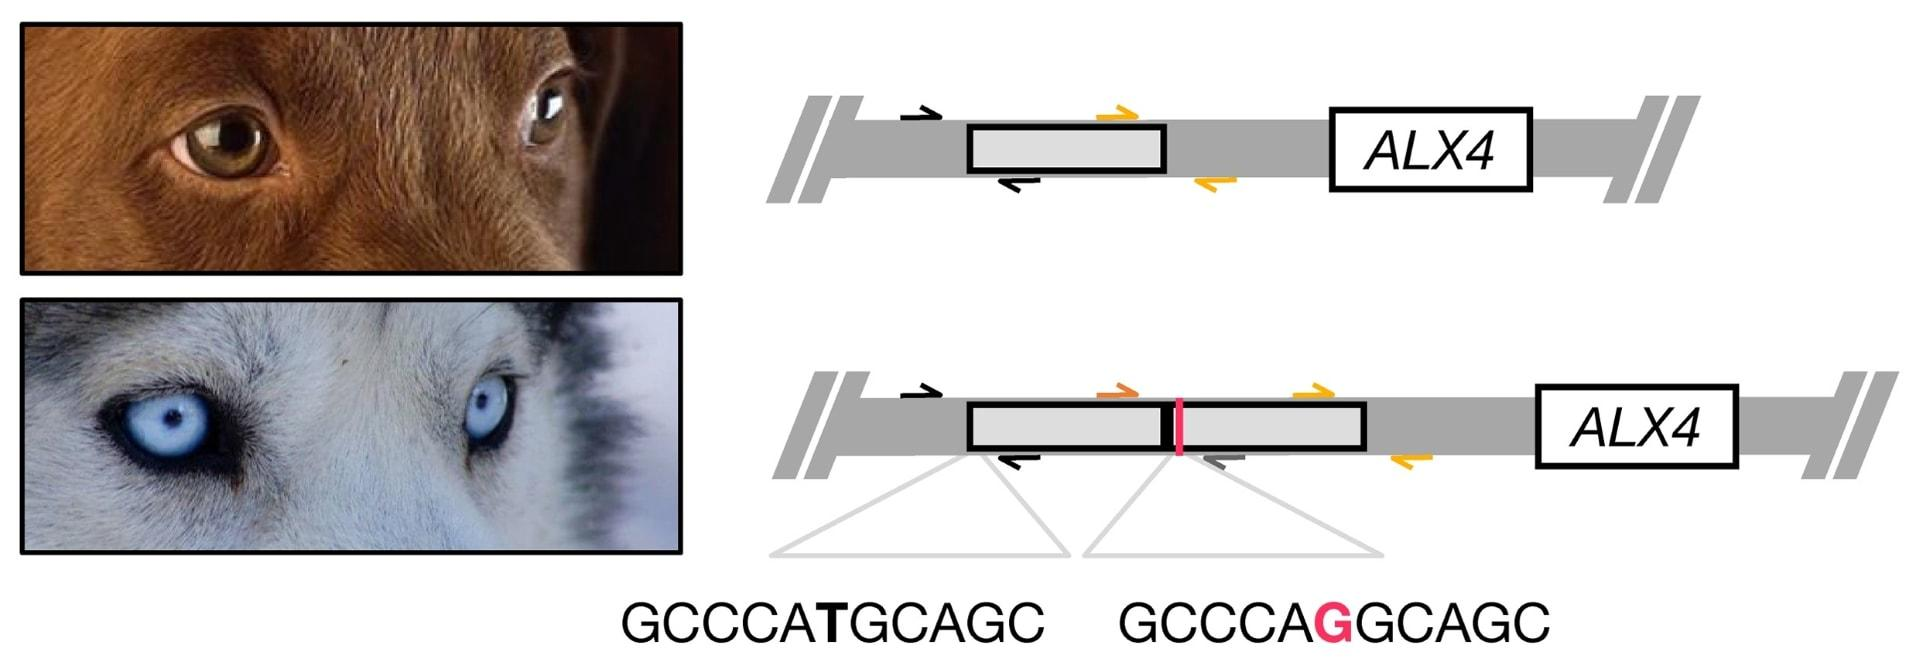 Генетики объяснили голубоглазость хаски